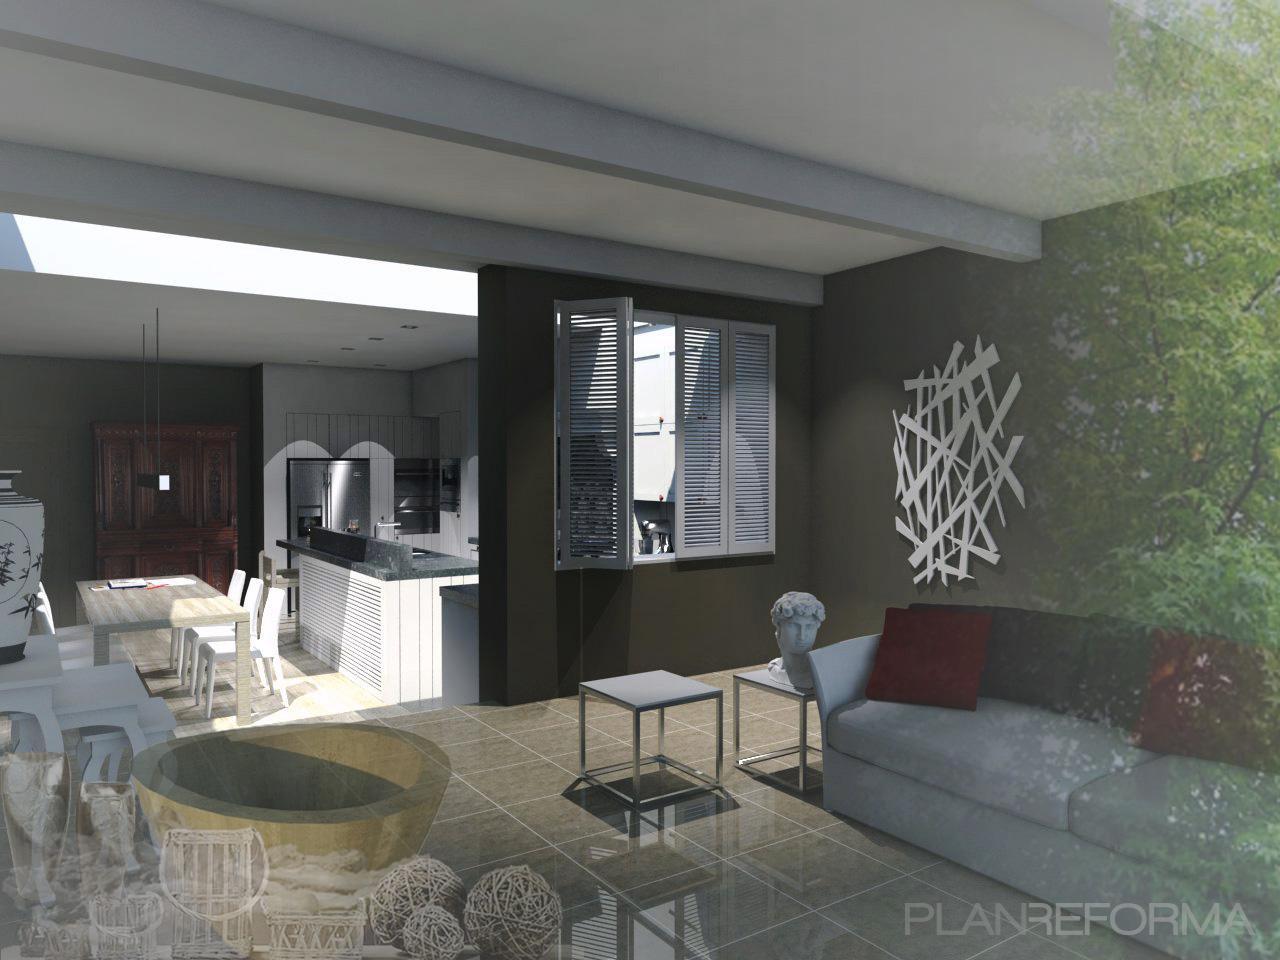 Comedor cocina salon style rustico color marron gris negro - Cocina salon comedor ...